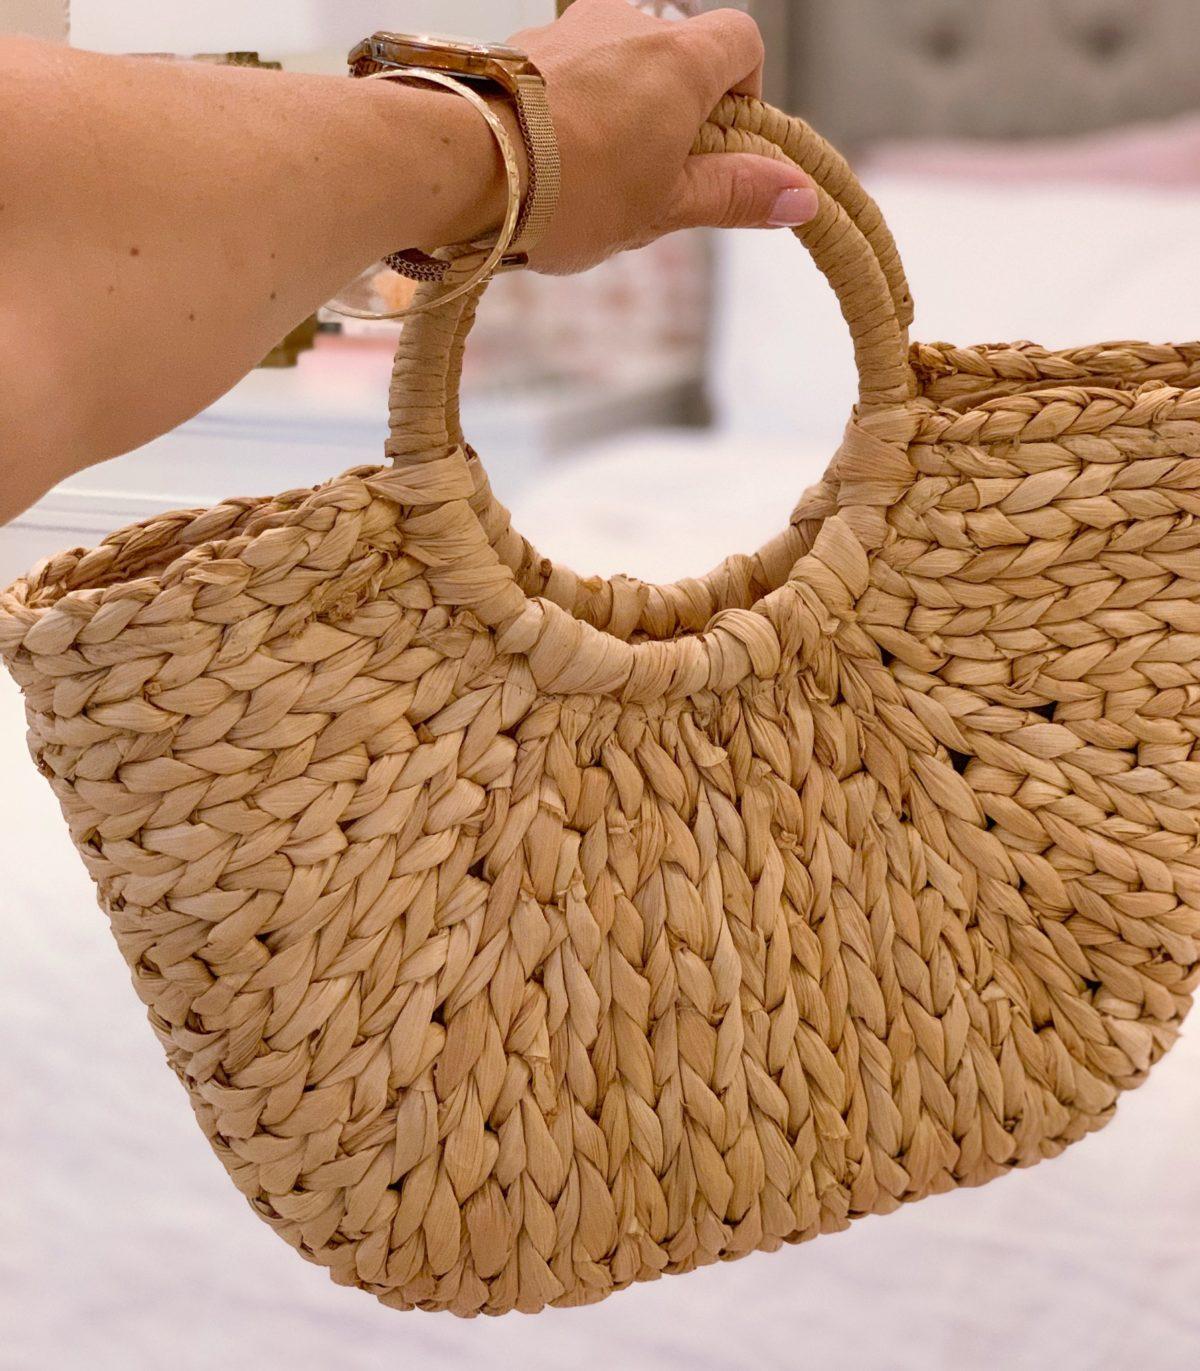 Amazon Fashion Haul Straw Beach Tote